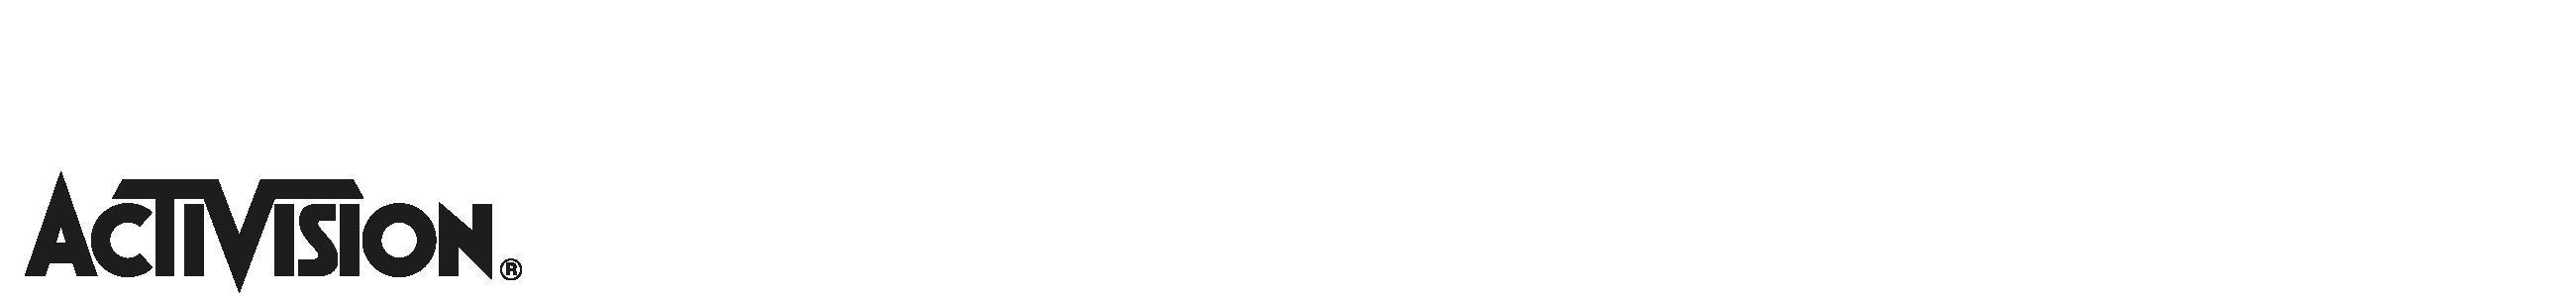 MADHOUSE – WEB_V3_SKYLANDERS – CLIENTES